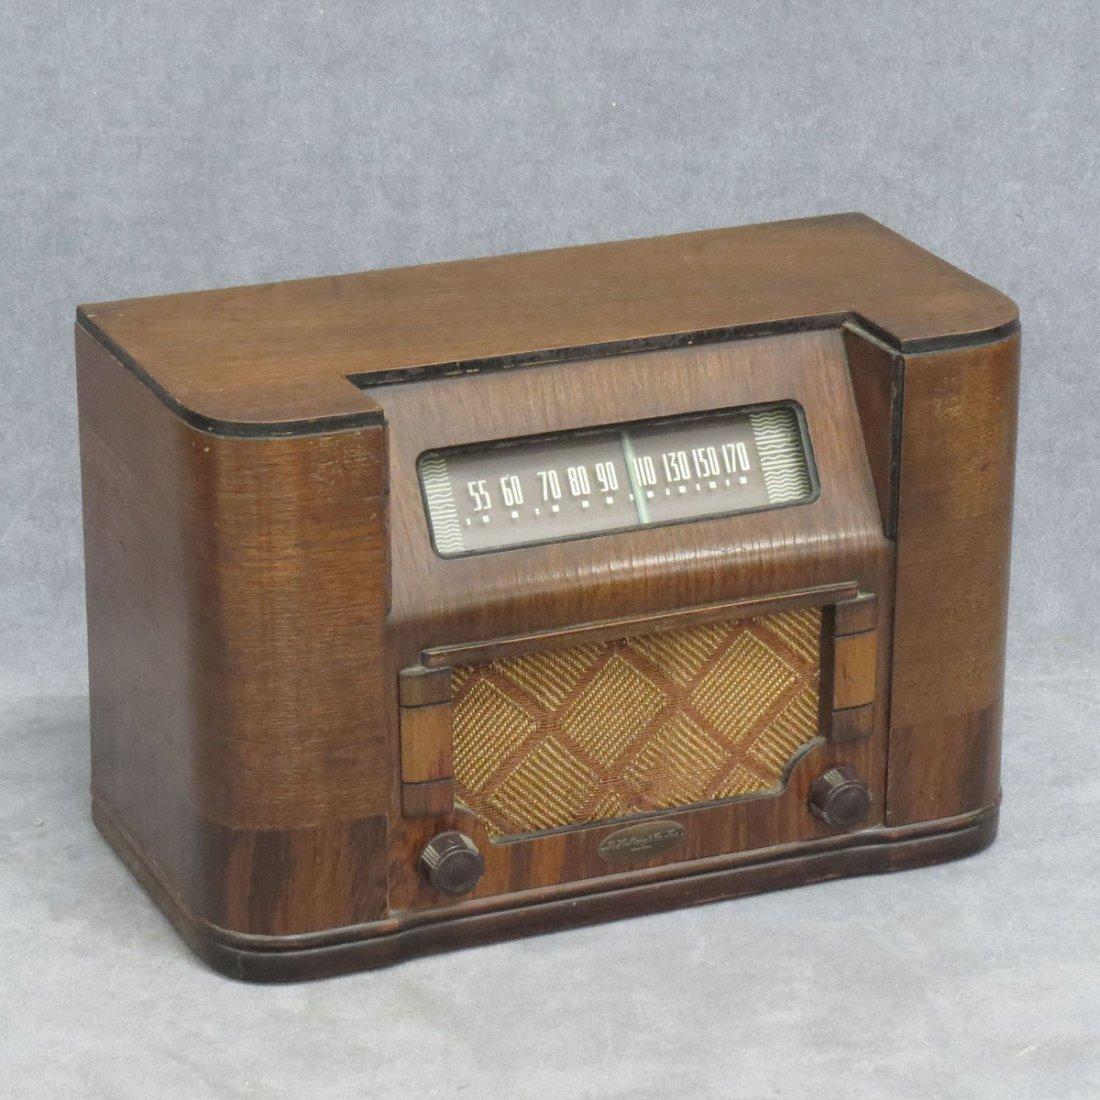 ART DECO MAHOGANY INLAID TABLE RADIO